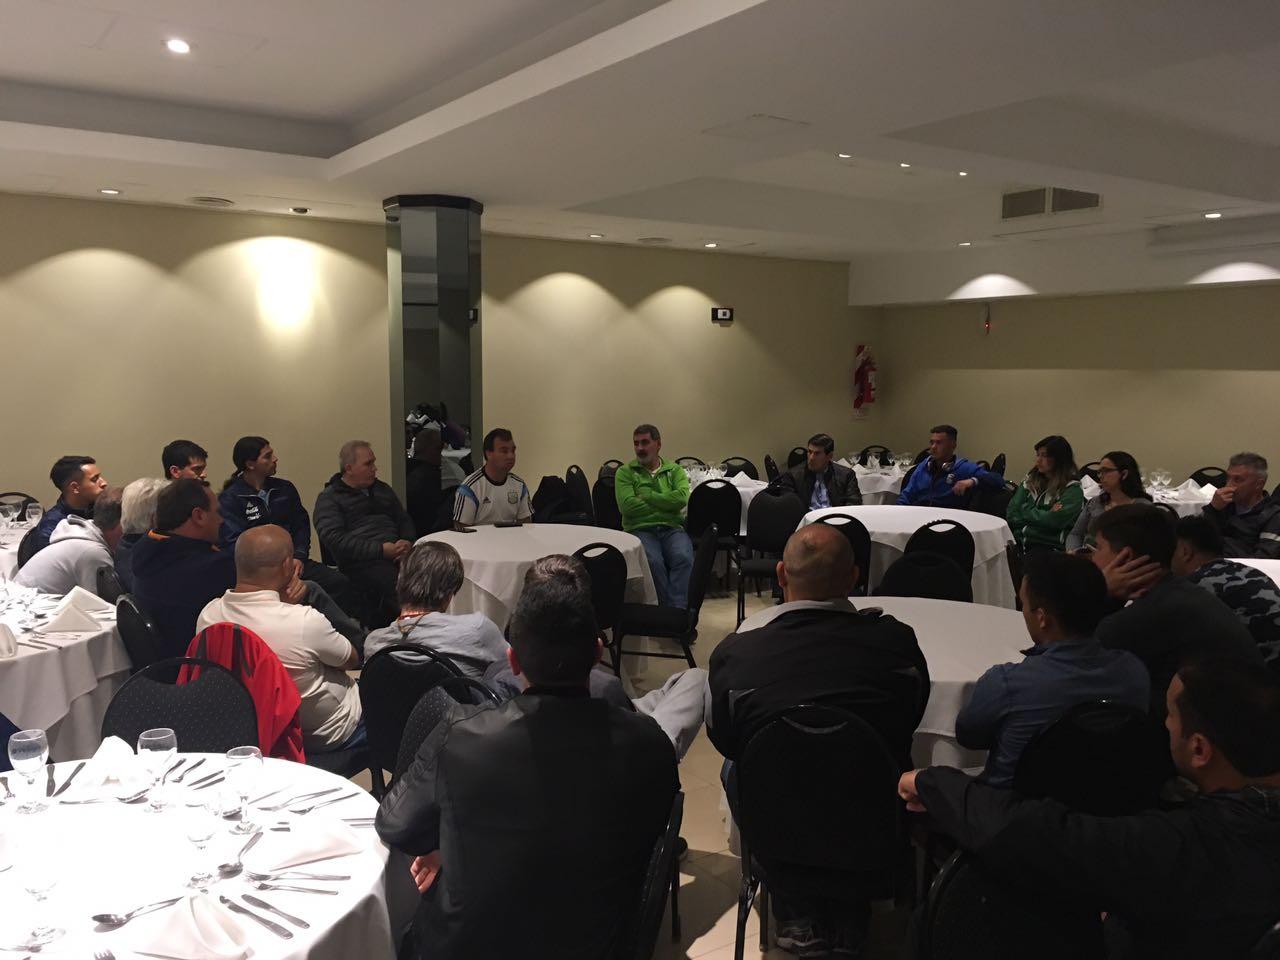 Se presentó la Selección Argentina de fútbol de síndrome de down